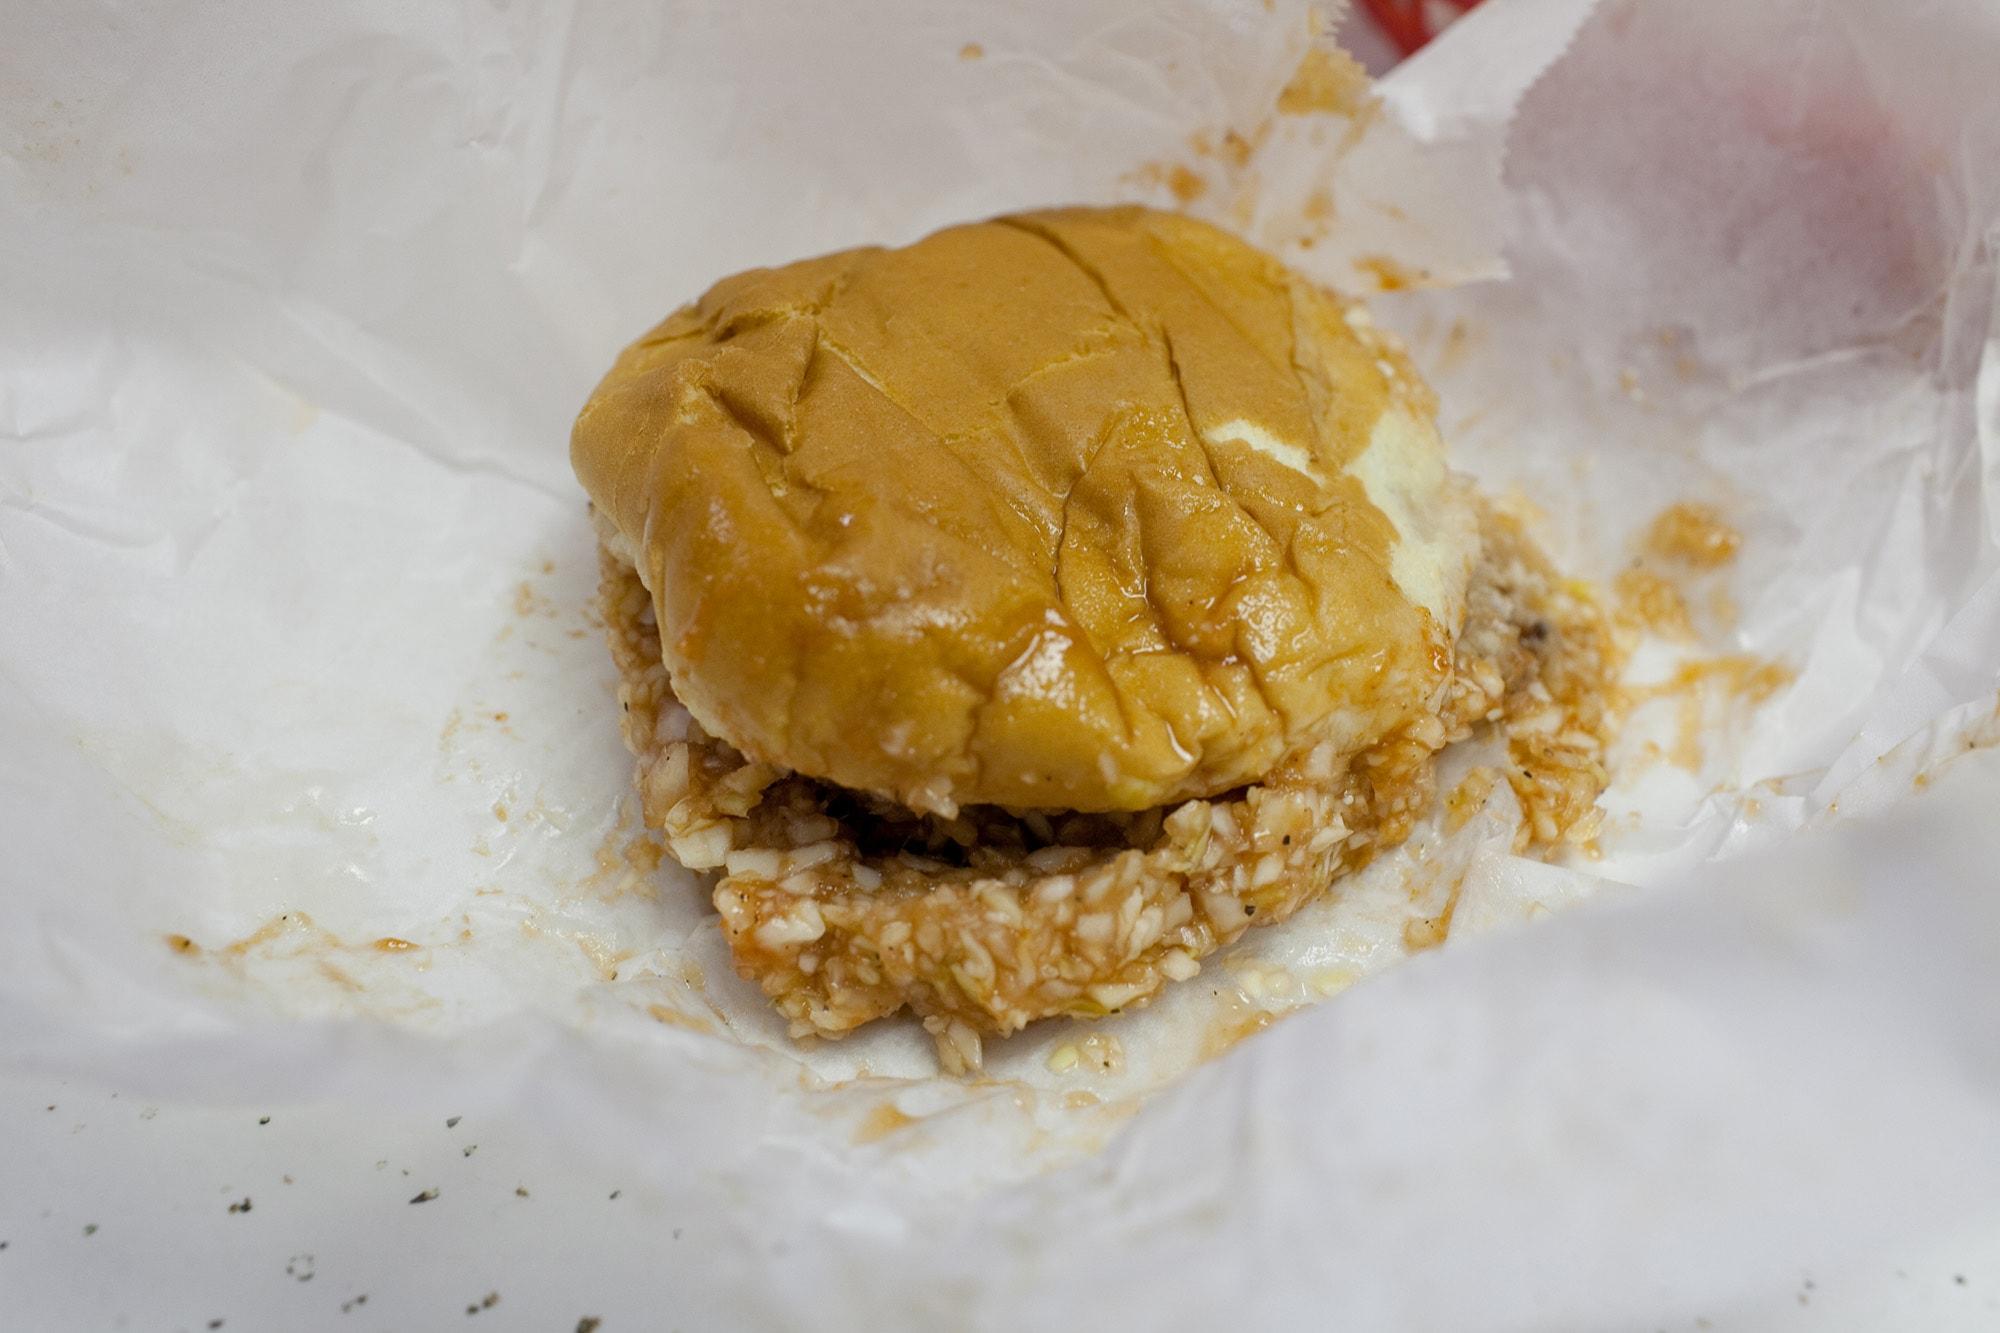 Virginia/North Carolina Road Trip - Lexington BBQ. - chopped BBQ sandwich, hush puppies, and fries